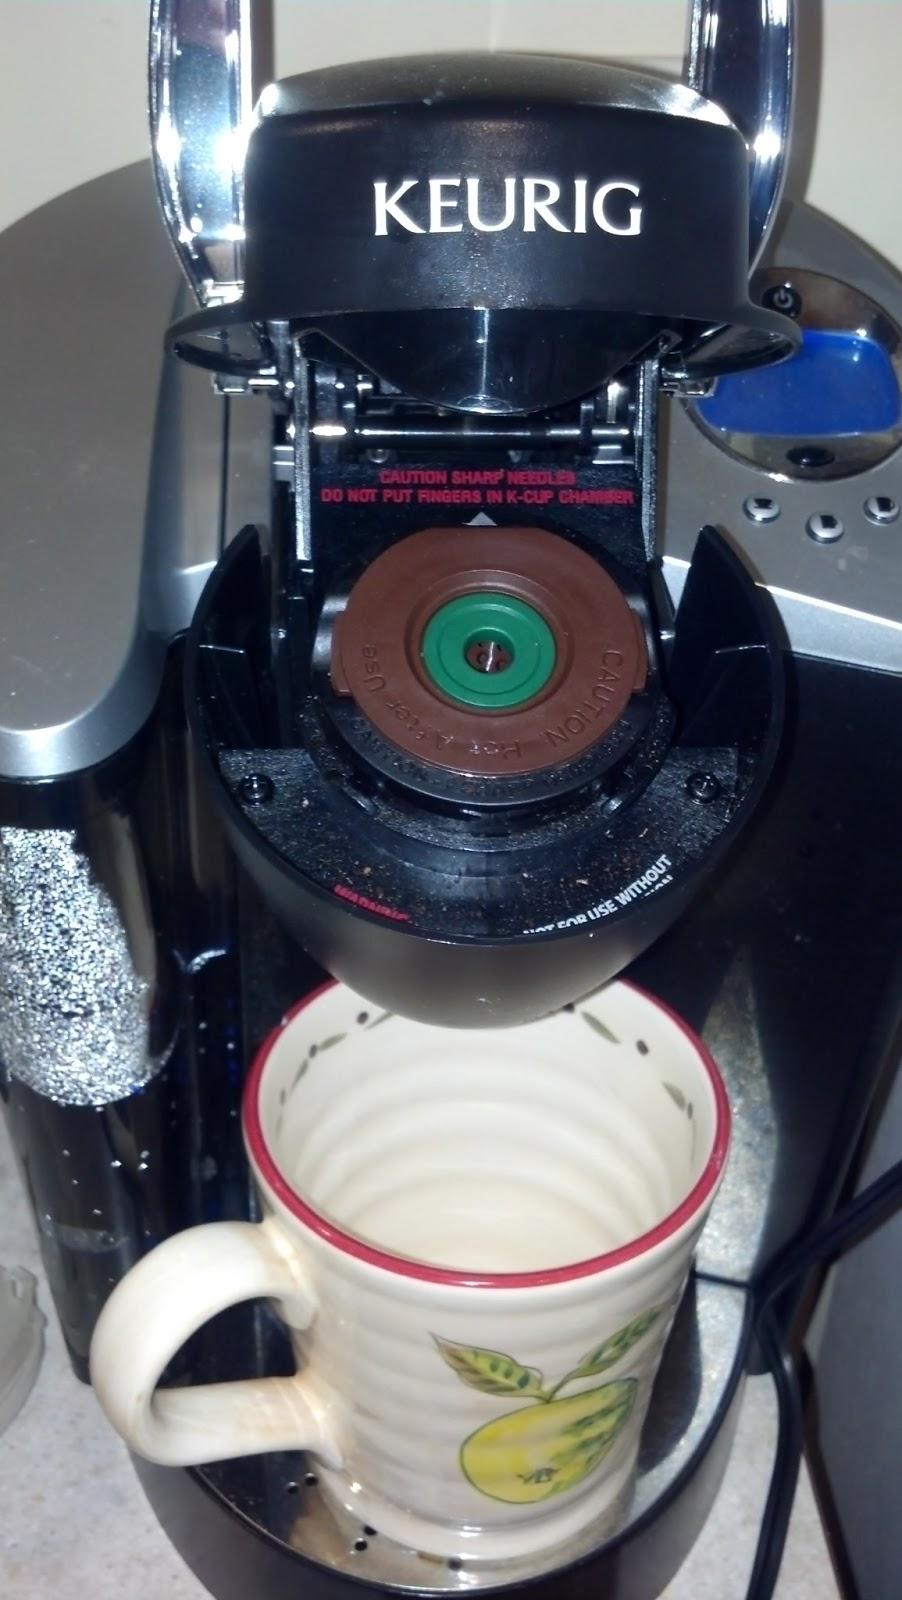 Keurig Coffee Maker Descaling With Vinegar : How To Descale Keurig